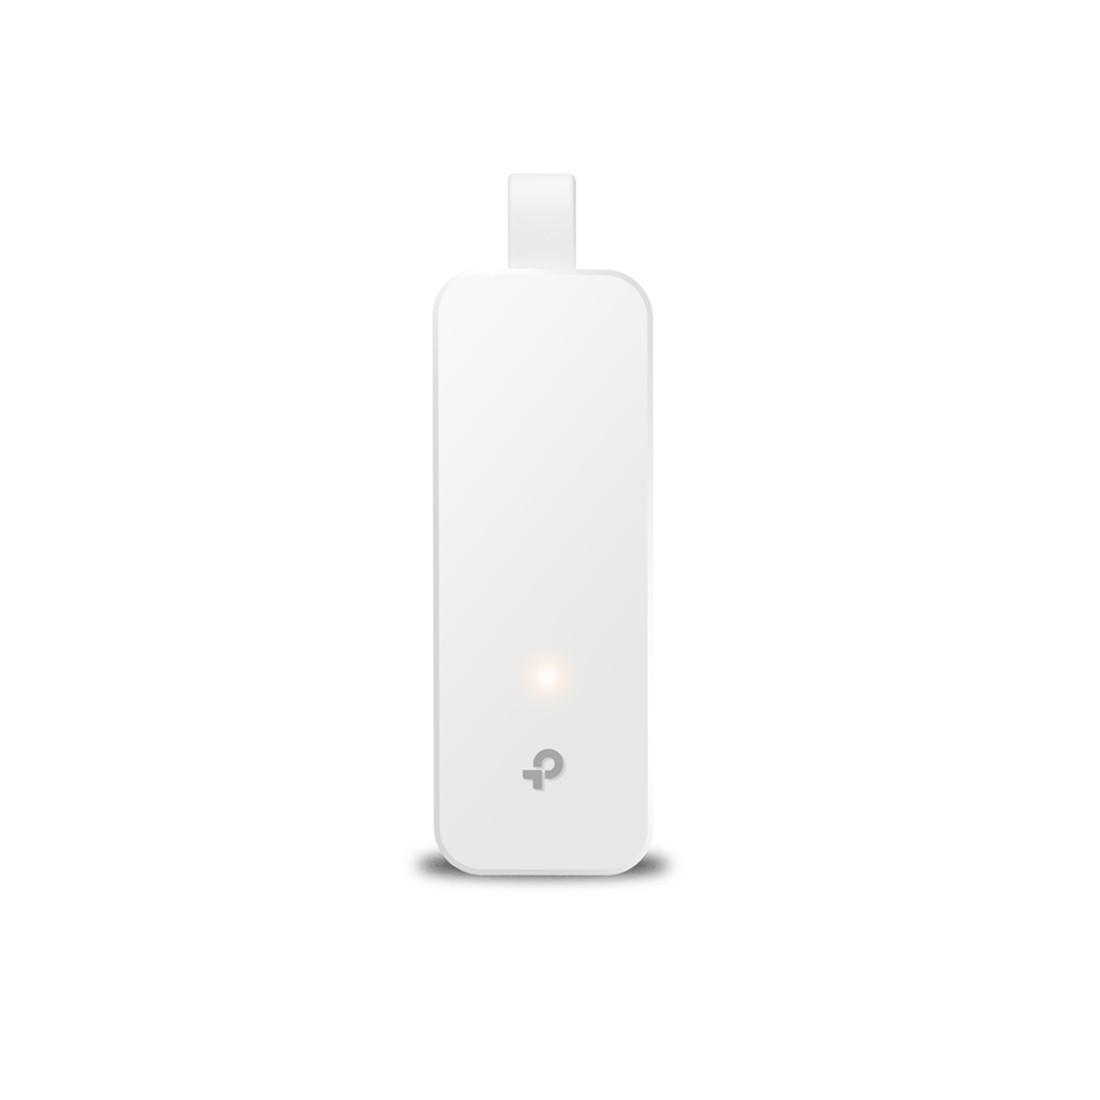 Сетевой адаптер USB GbE Tp-Link UE300